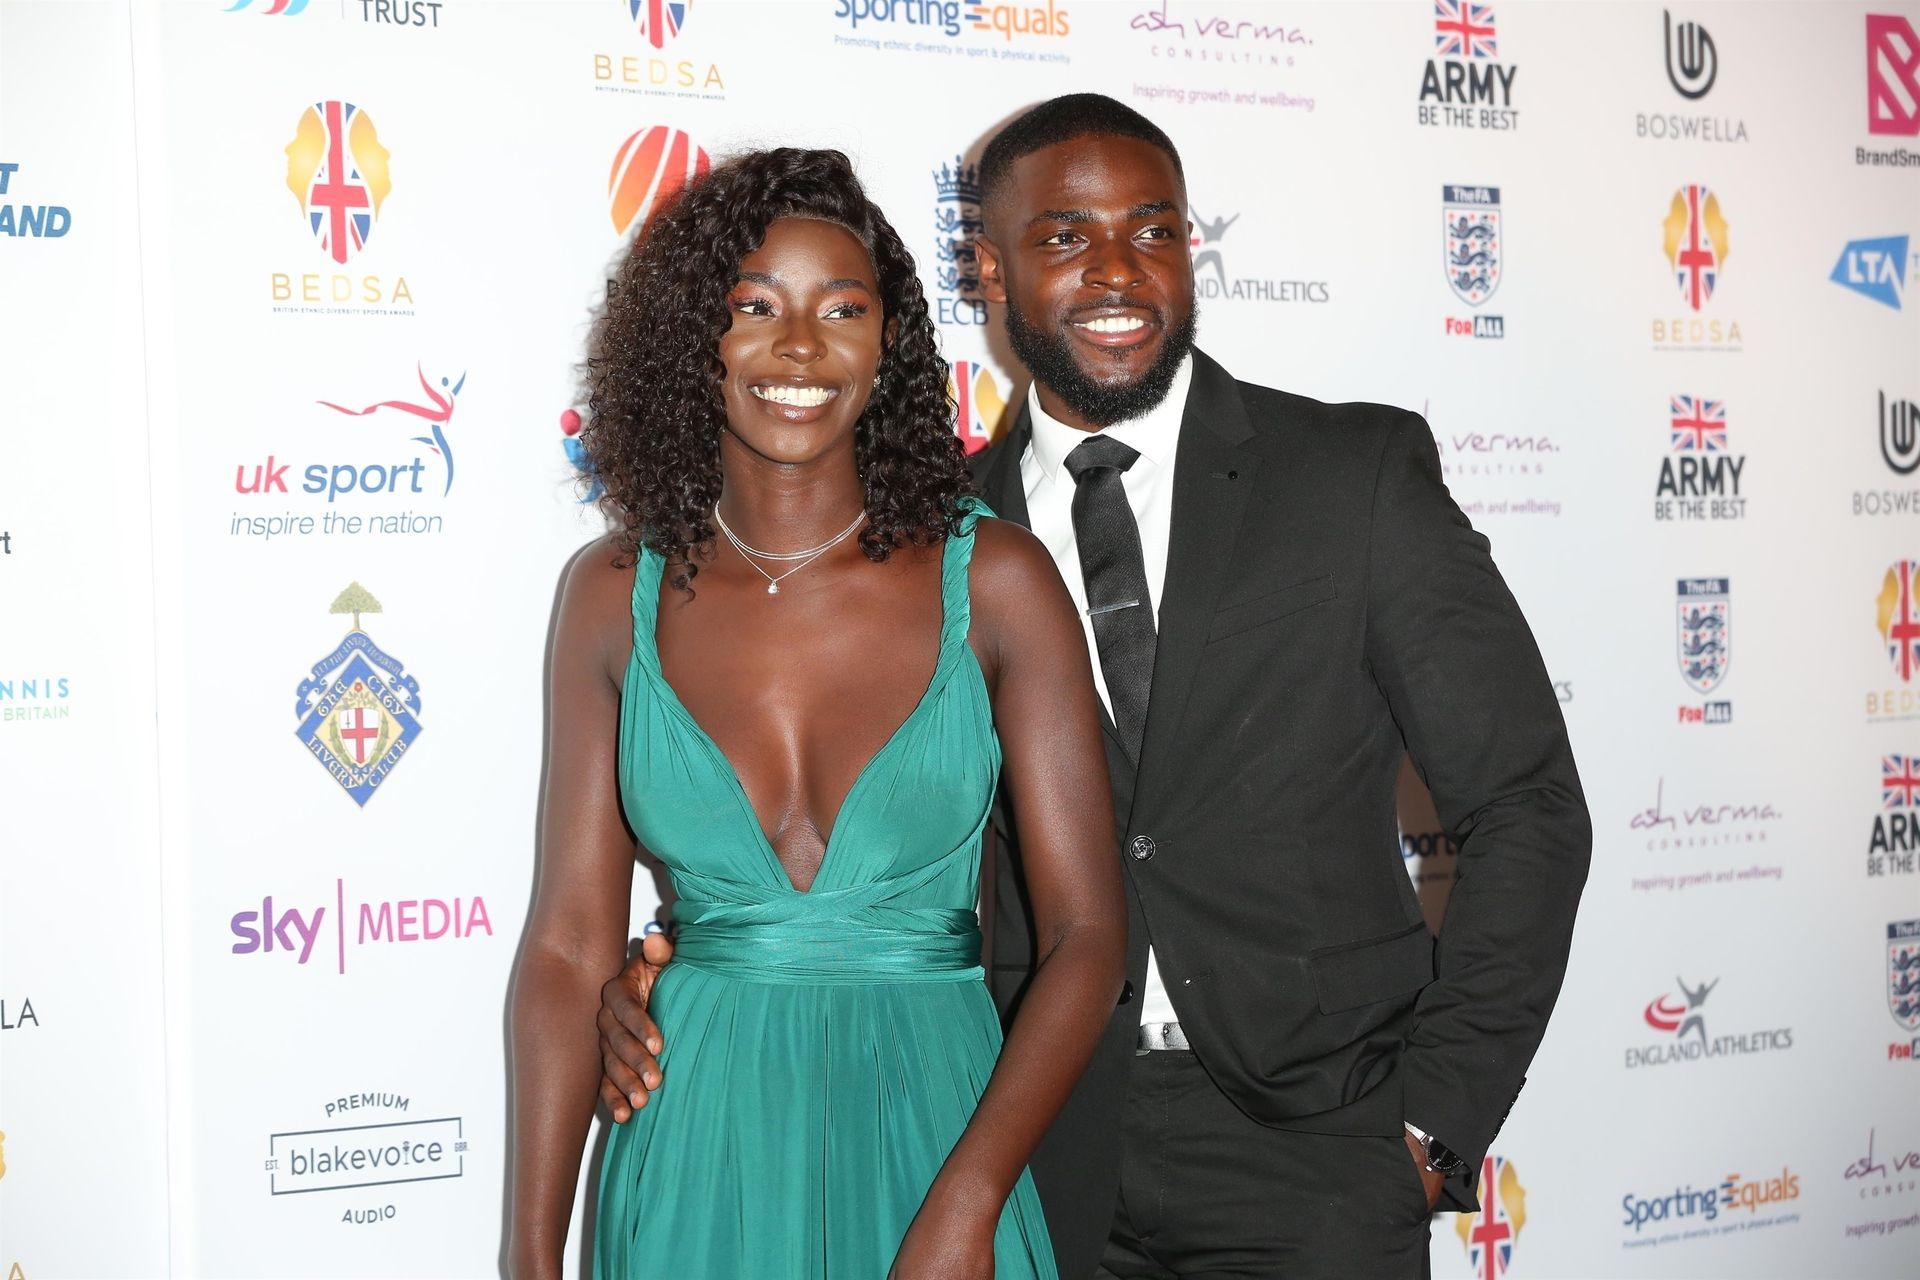 Mike Boateng & Priscilla Anyabu Are Seen At British Ethnic Diversity Sports Awards 0052